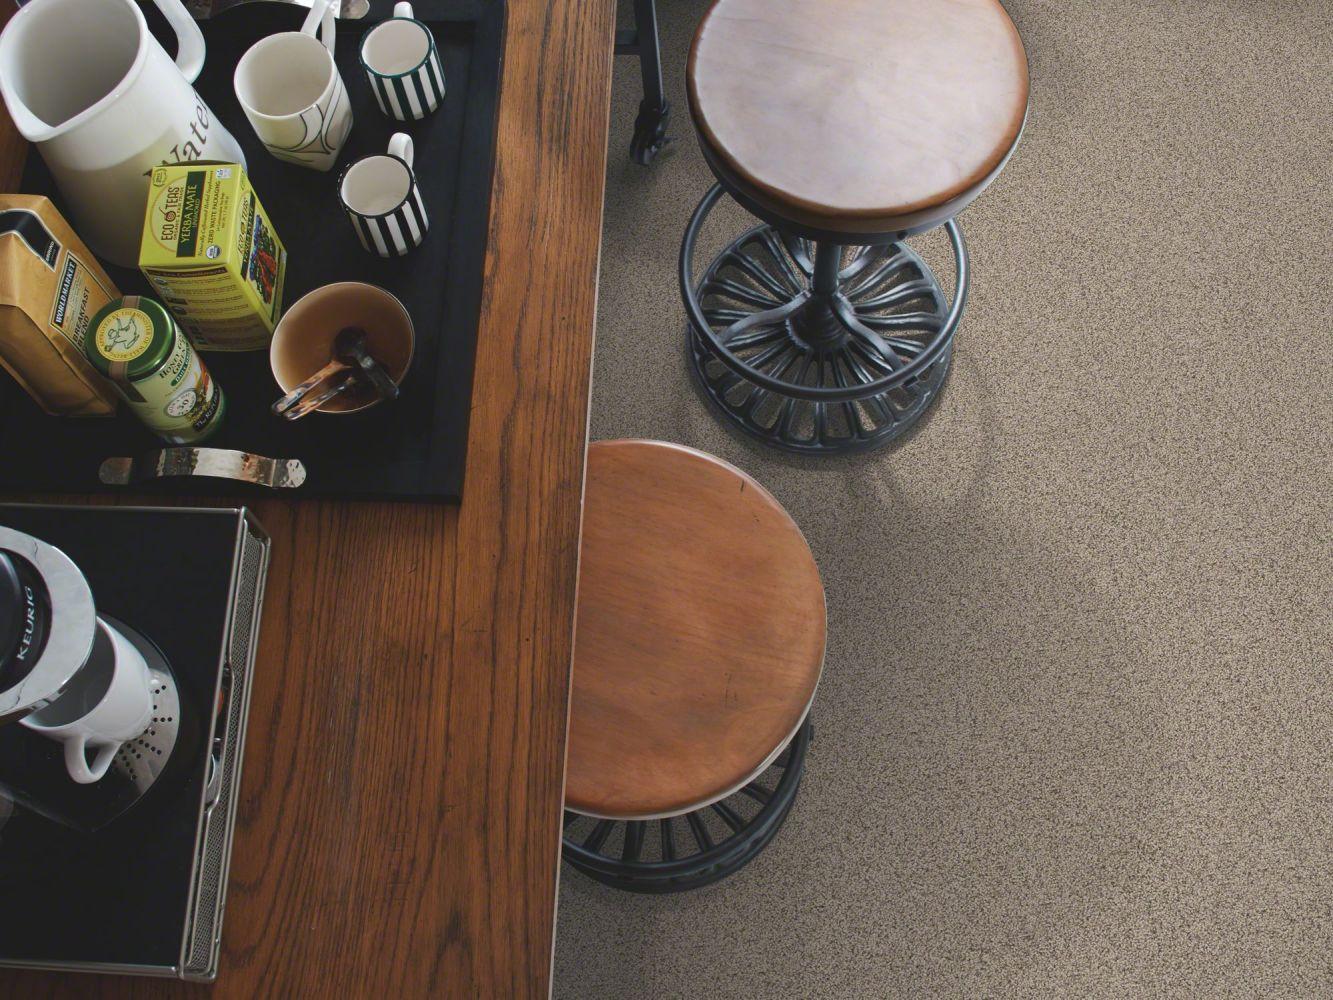 Shaw Floors Nfa/Apg Detailed Artistry I Bridge Way 00174_NA328